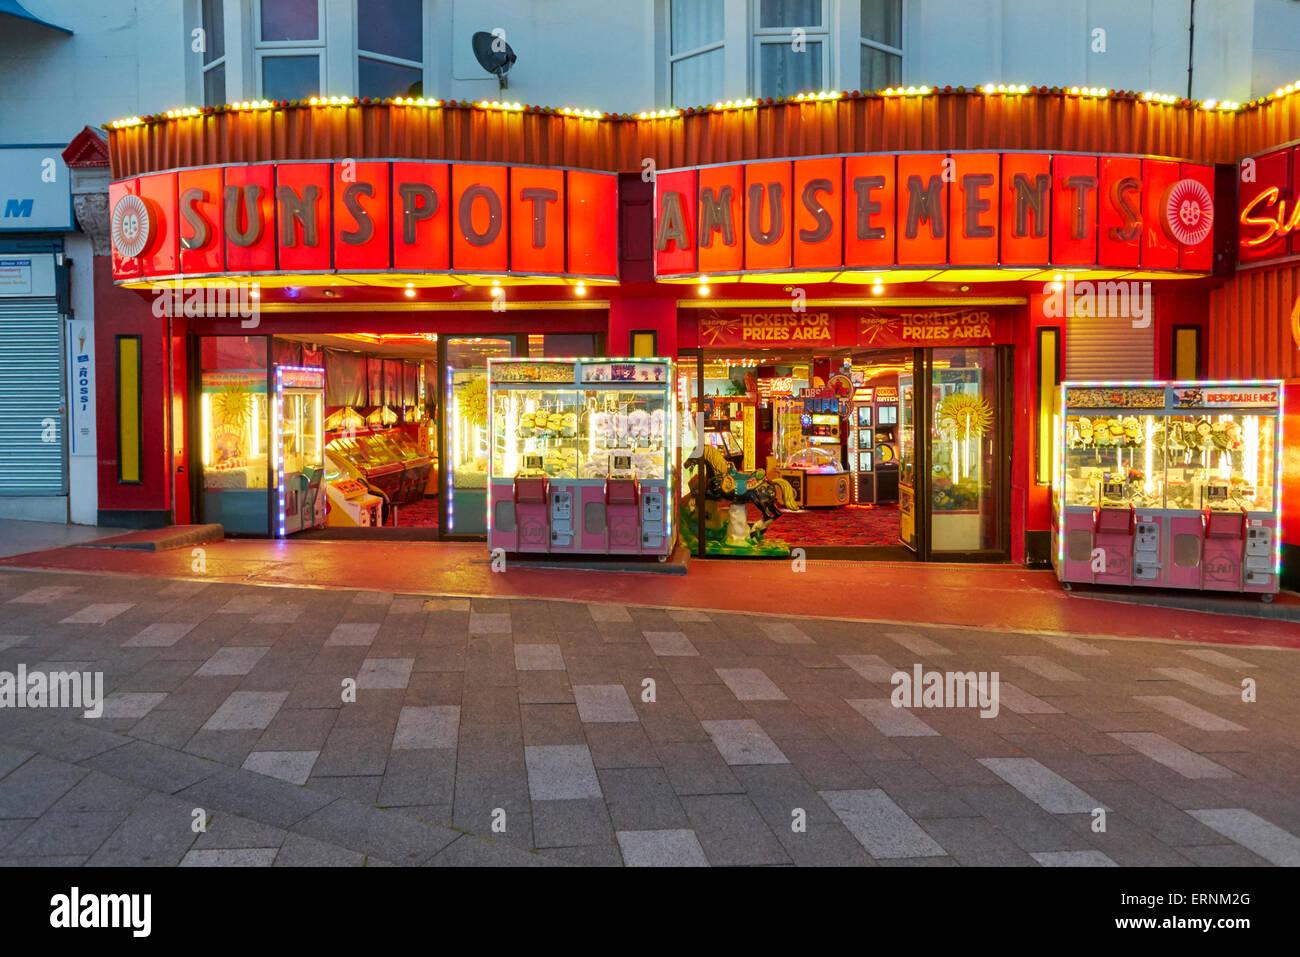 Sunsopt Amusements Southend On Sea, Essex - Stock Image